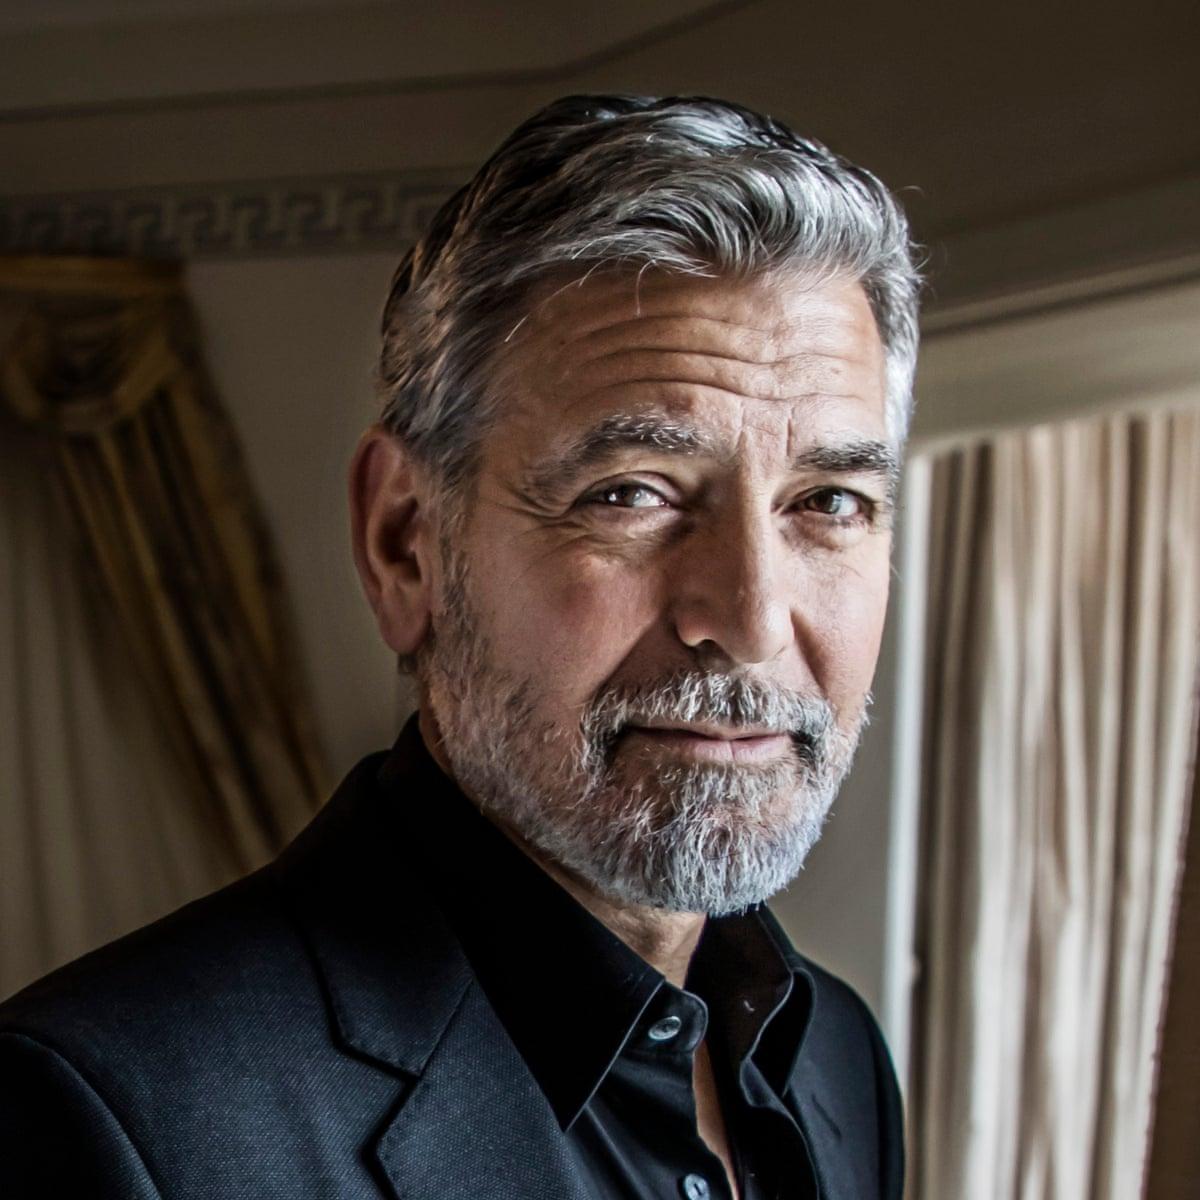 George Clooney George Clooney   Top 10 richest actors in the world 2021, highest-paid actors in the world 2021  